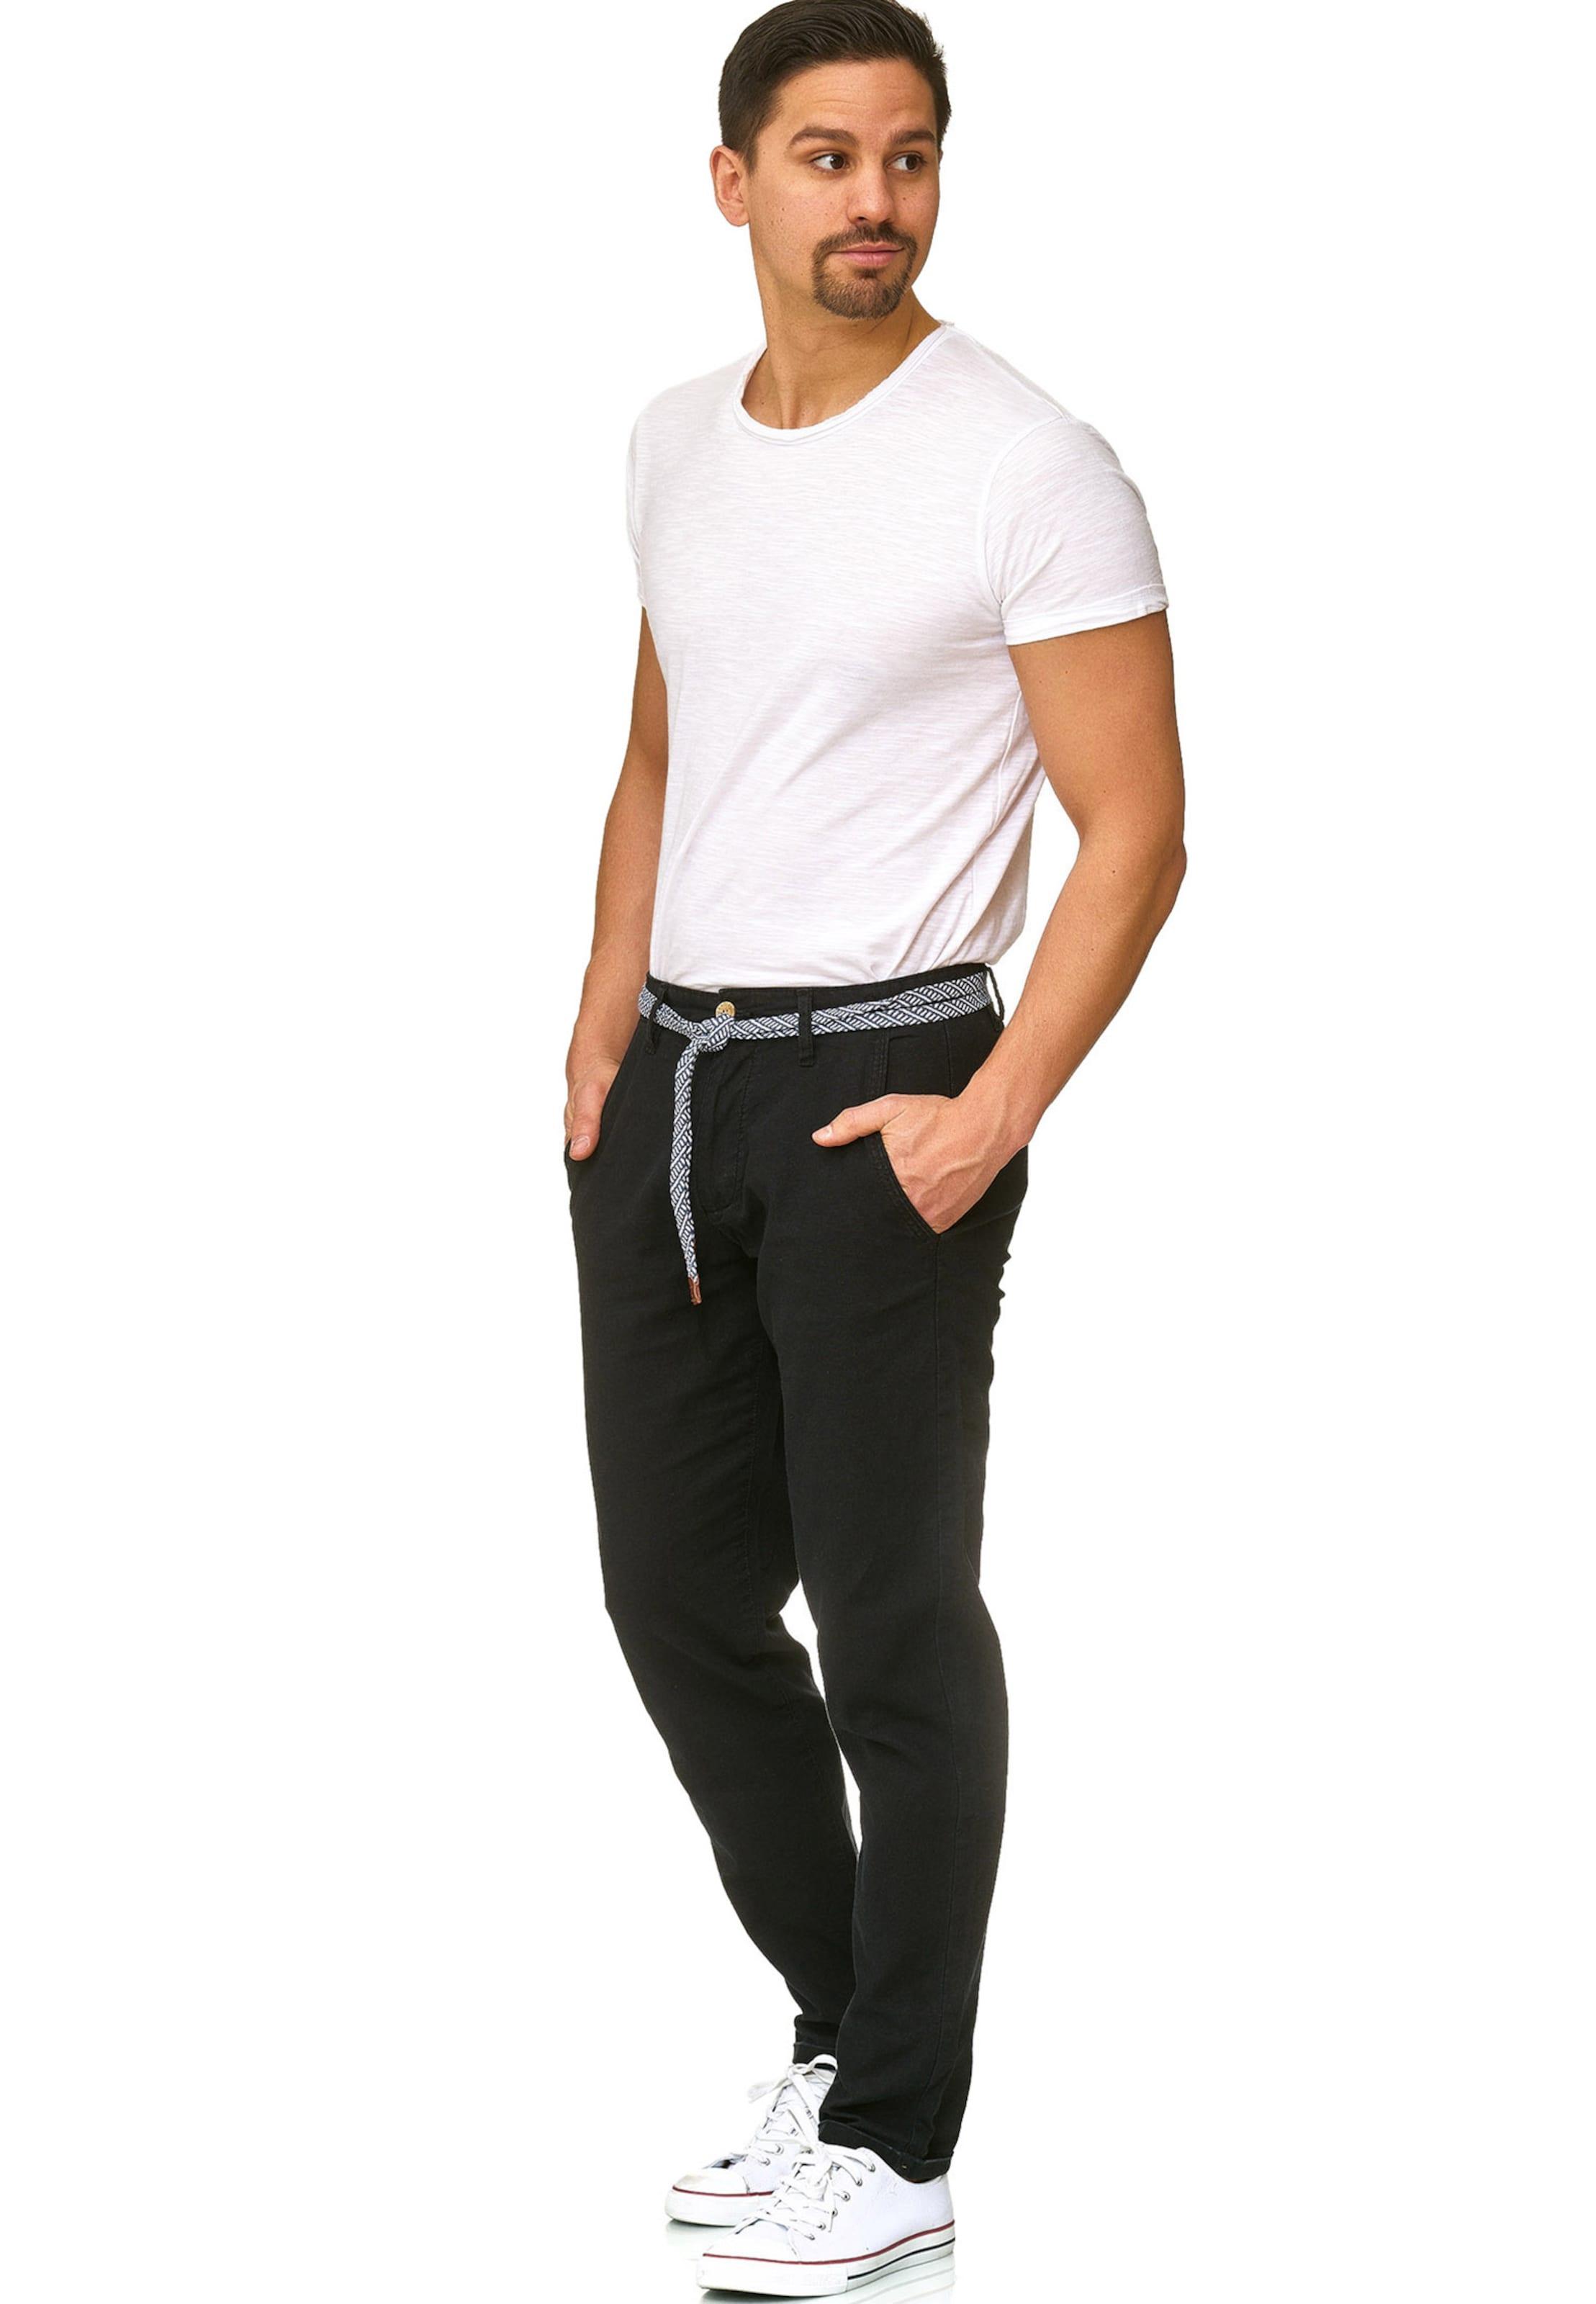 In Hose Jeans 'haverfiel' Indicode Schwarz uTlcFJ13K